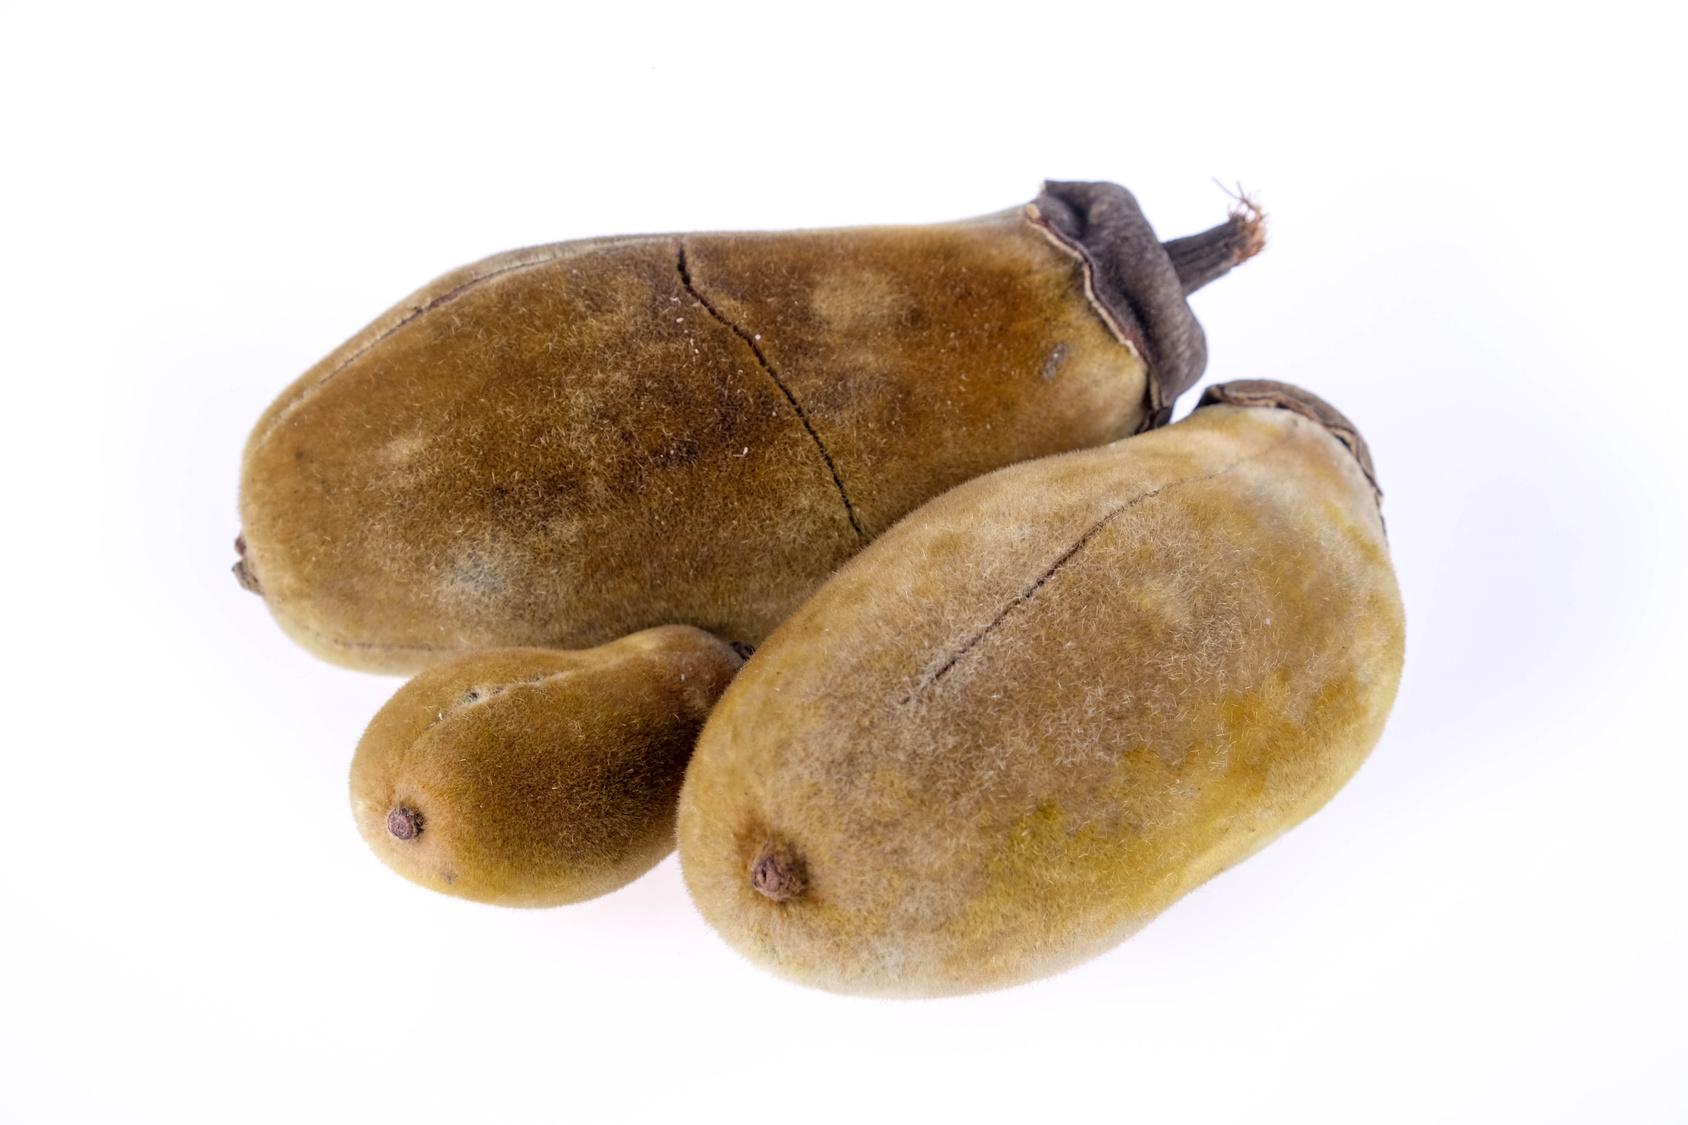 Baobabfrucht